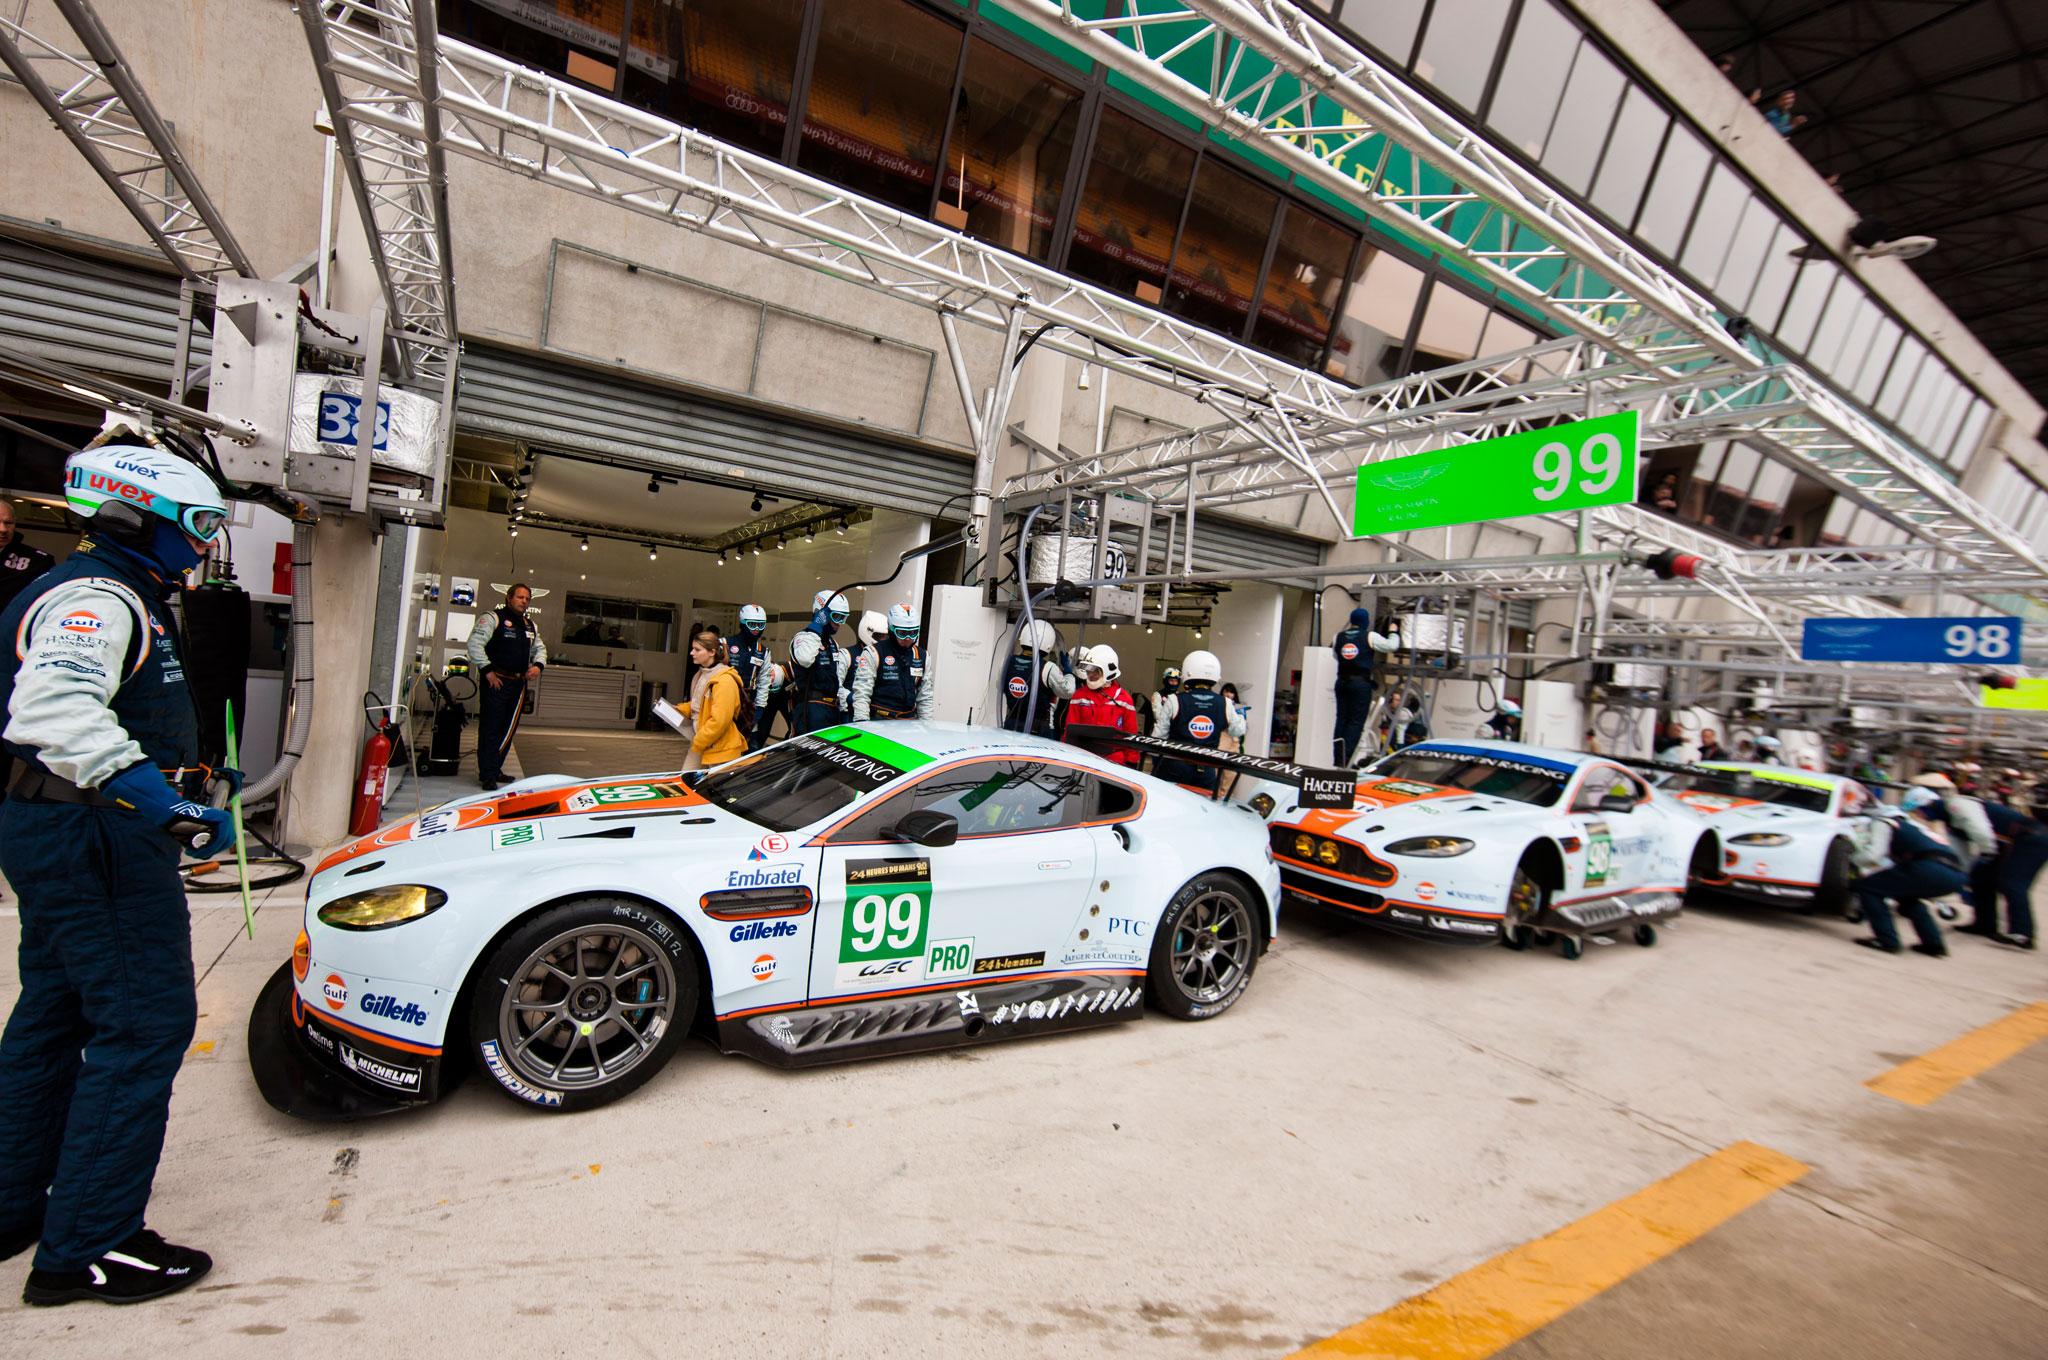 Aston Martin V8 Vantage Le Mans Car Lineup1